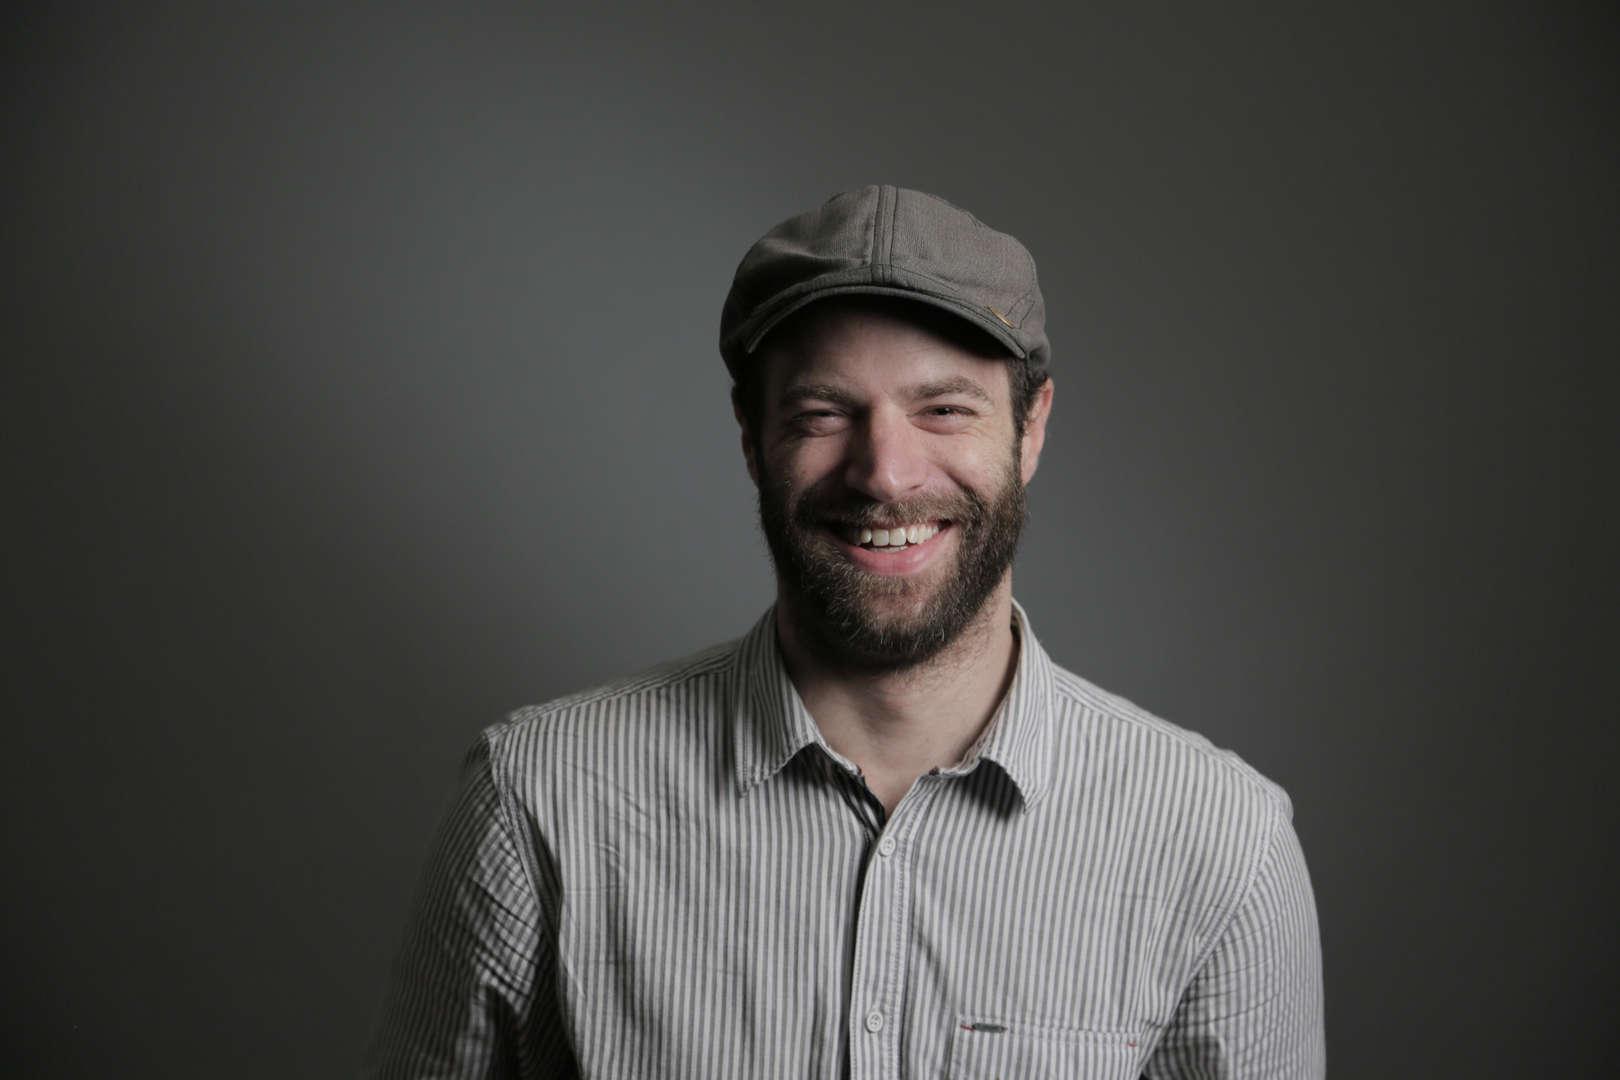 Craig Schoenbaum